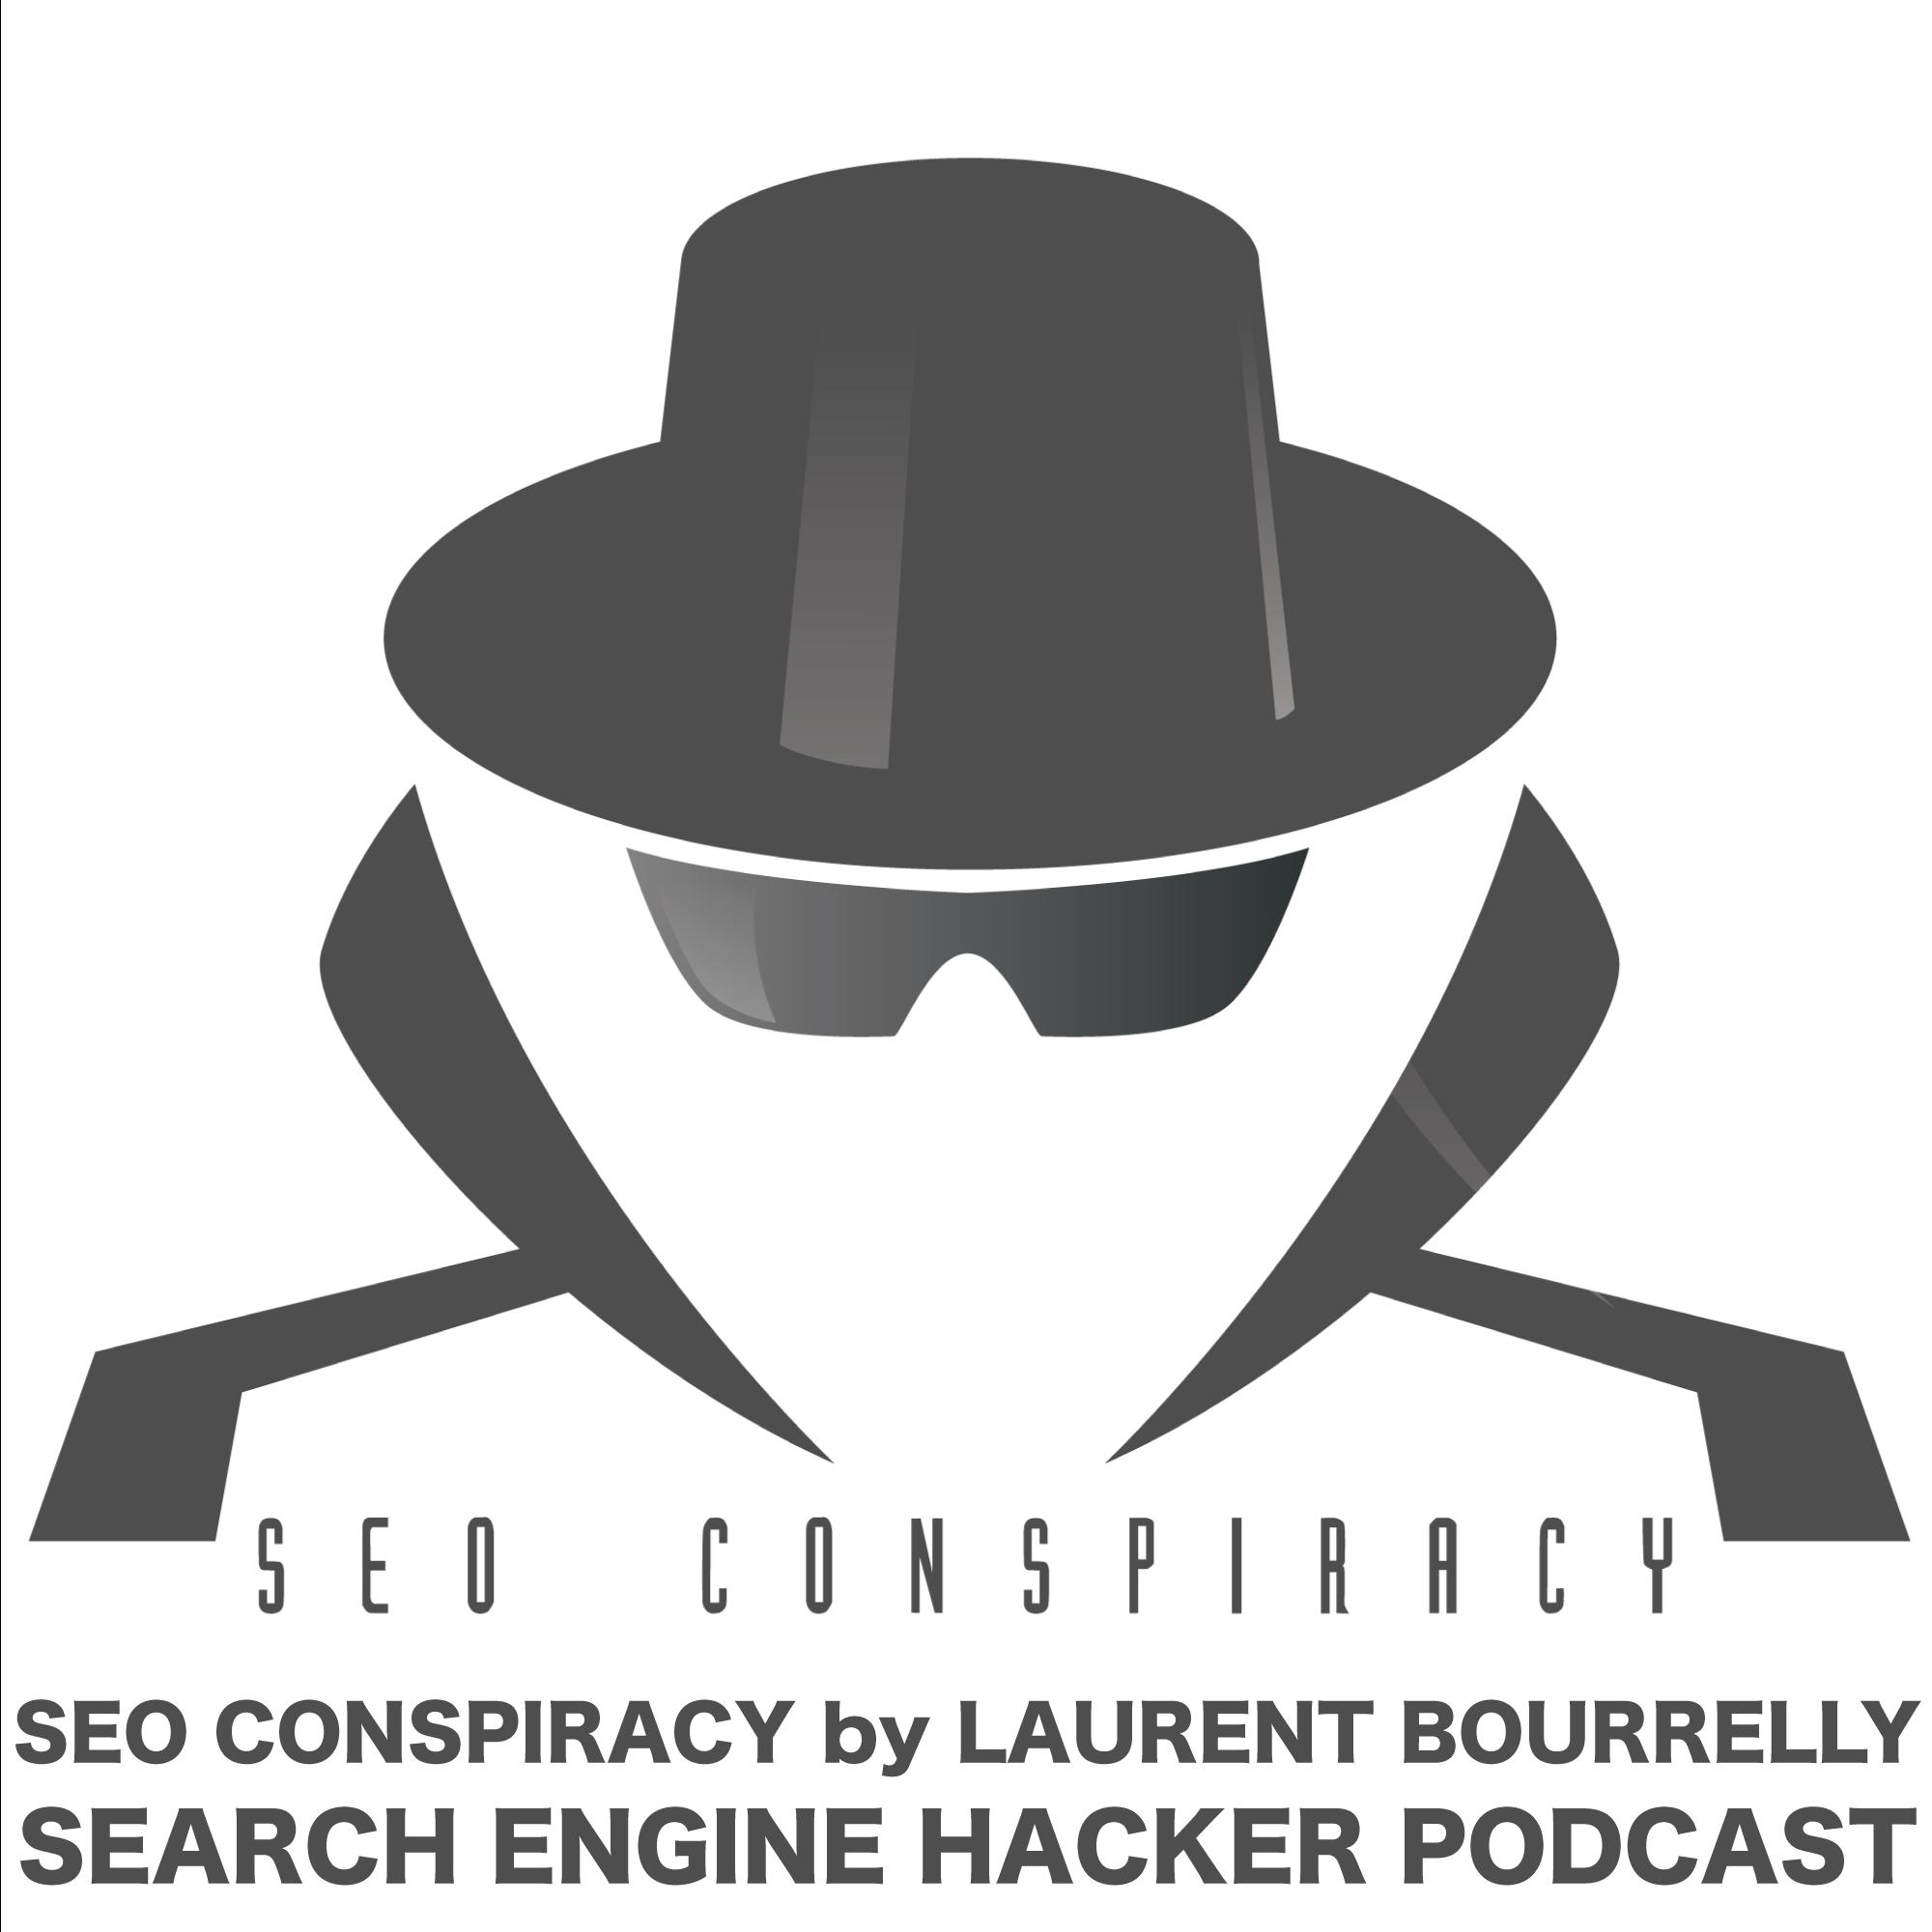 How to get GoogleBot to Visit More Often my Website?